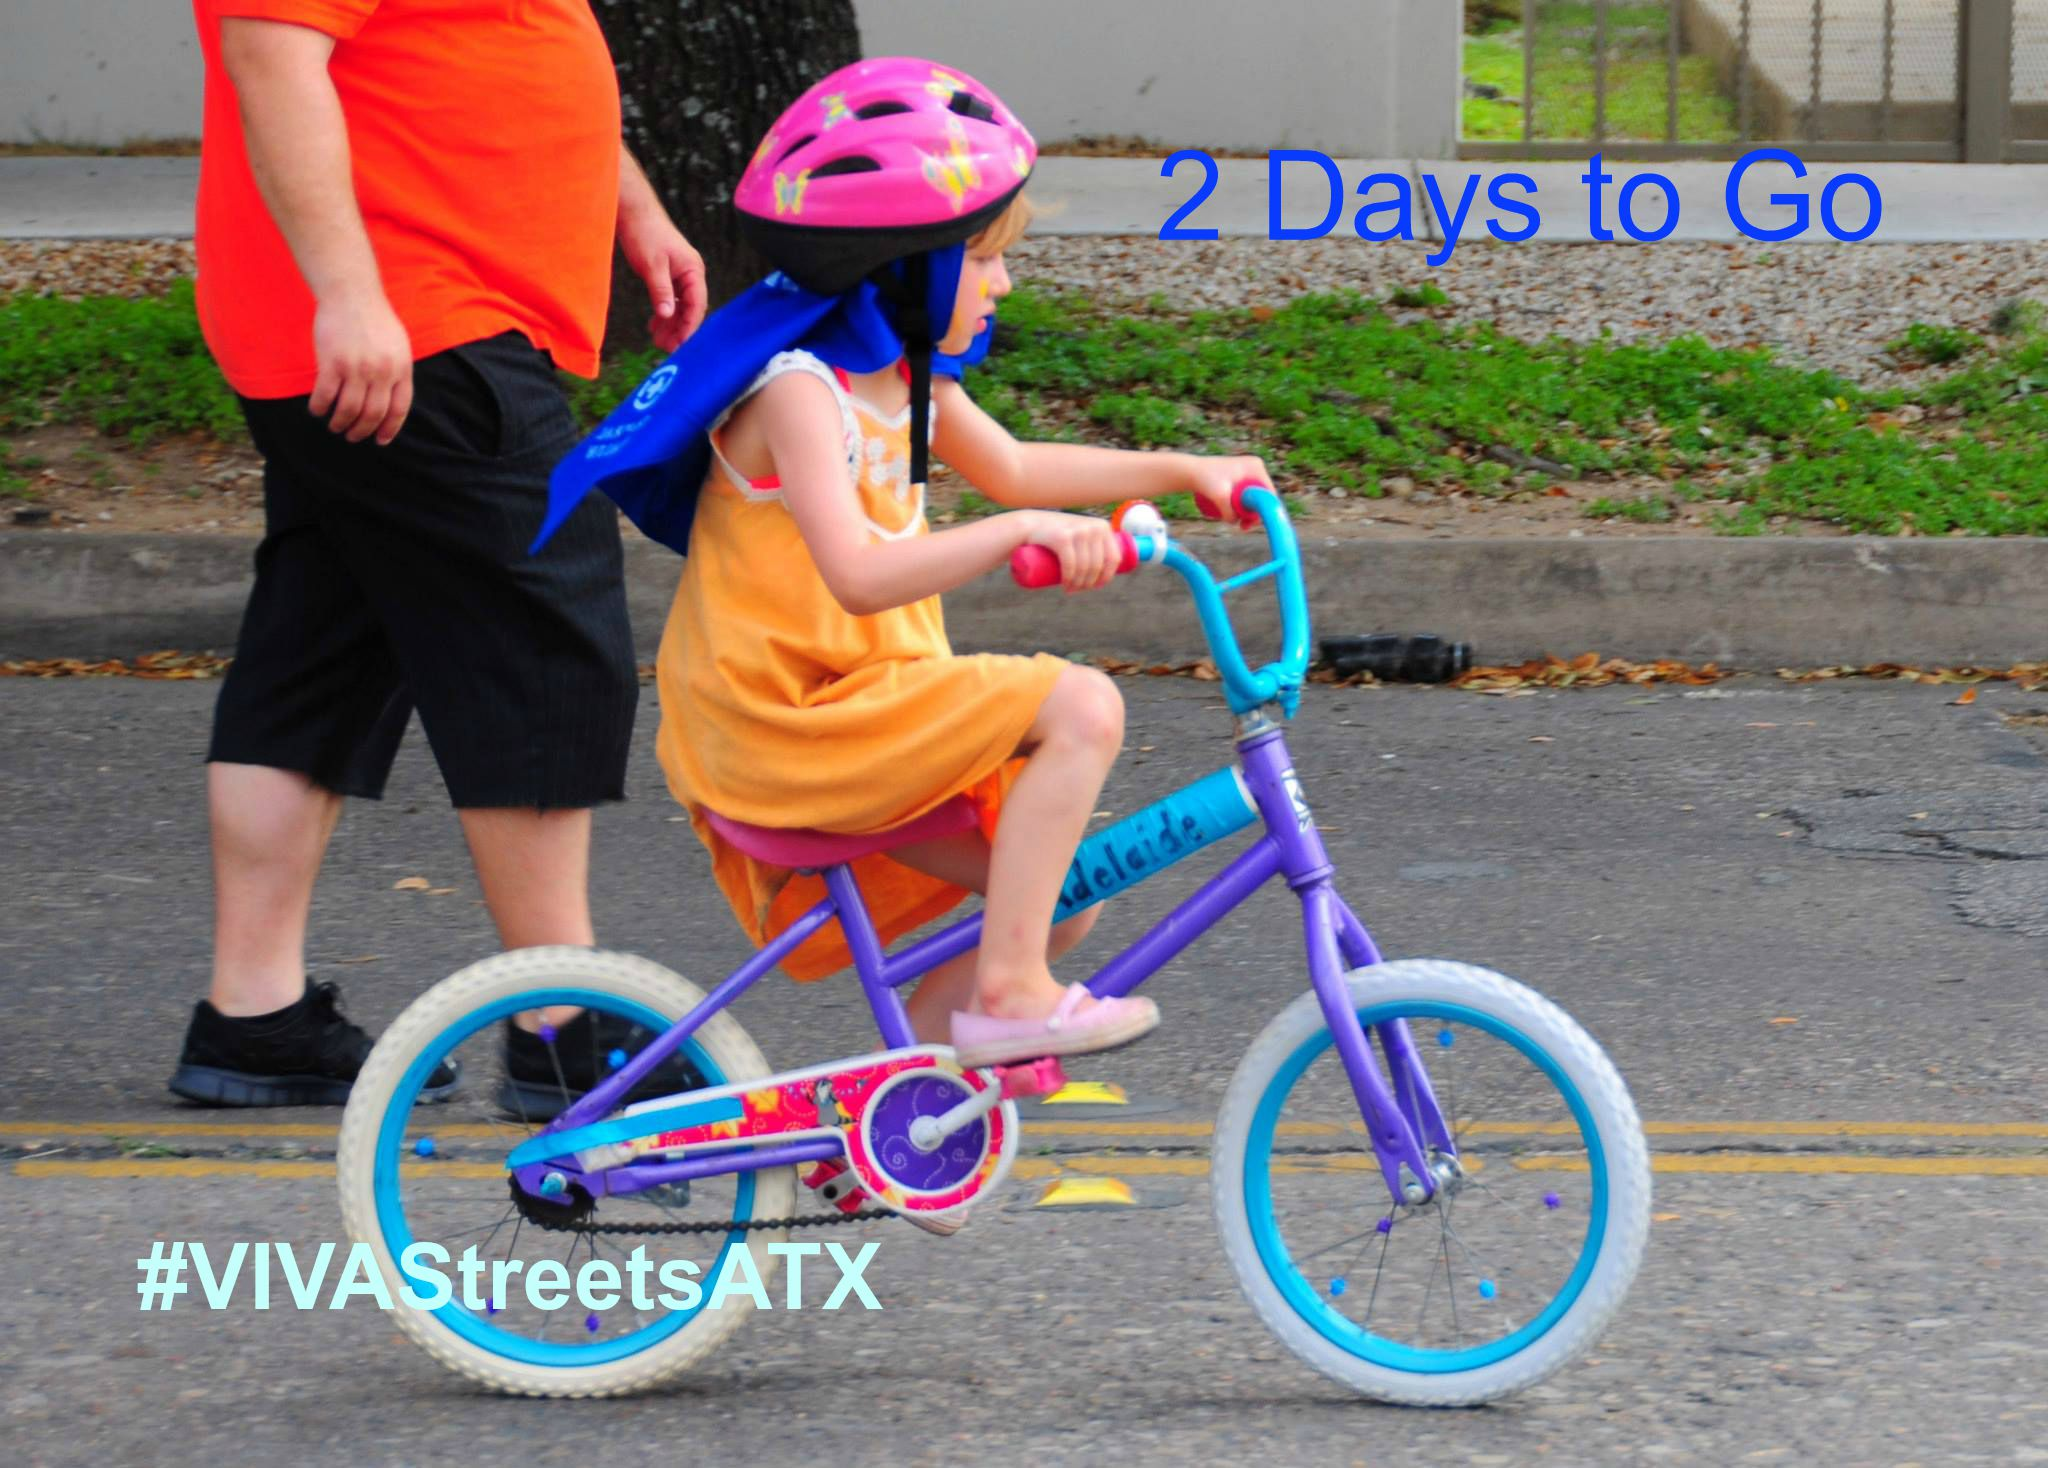 viva countdown 2 days